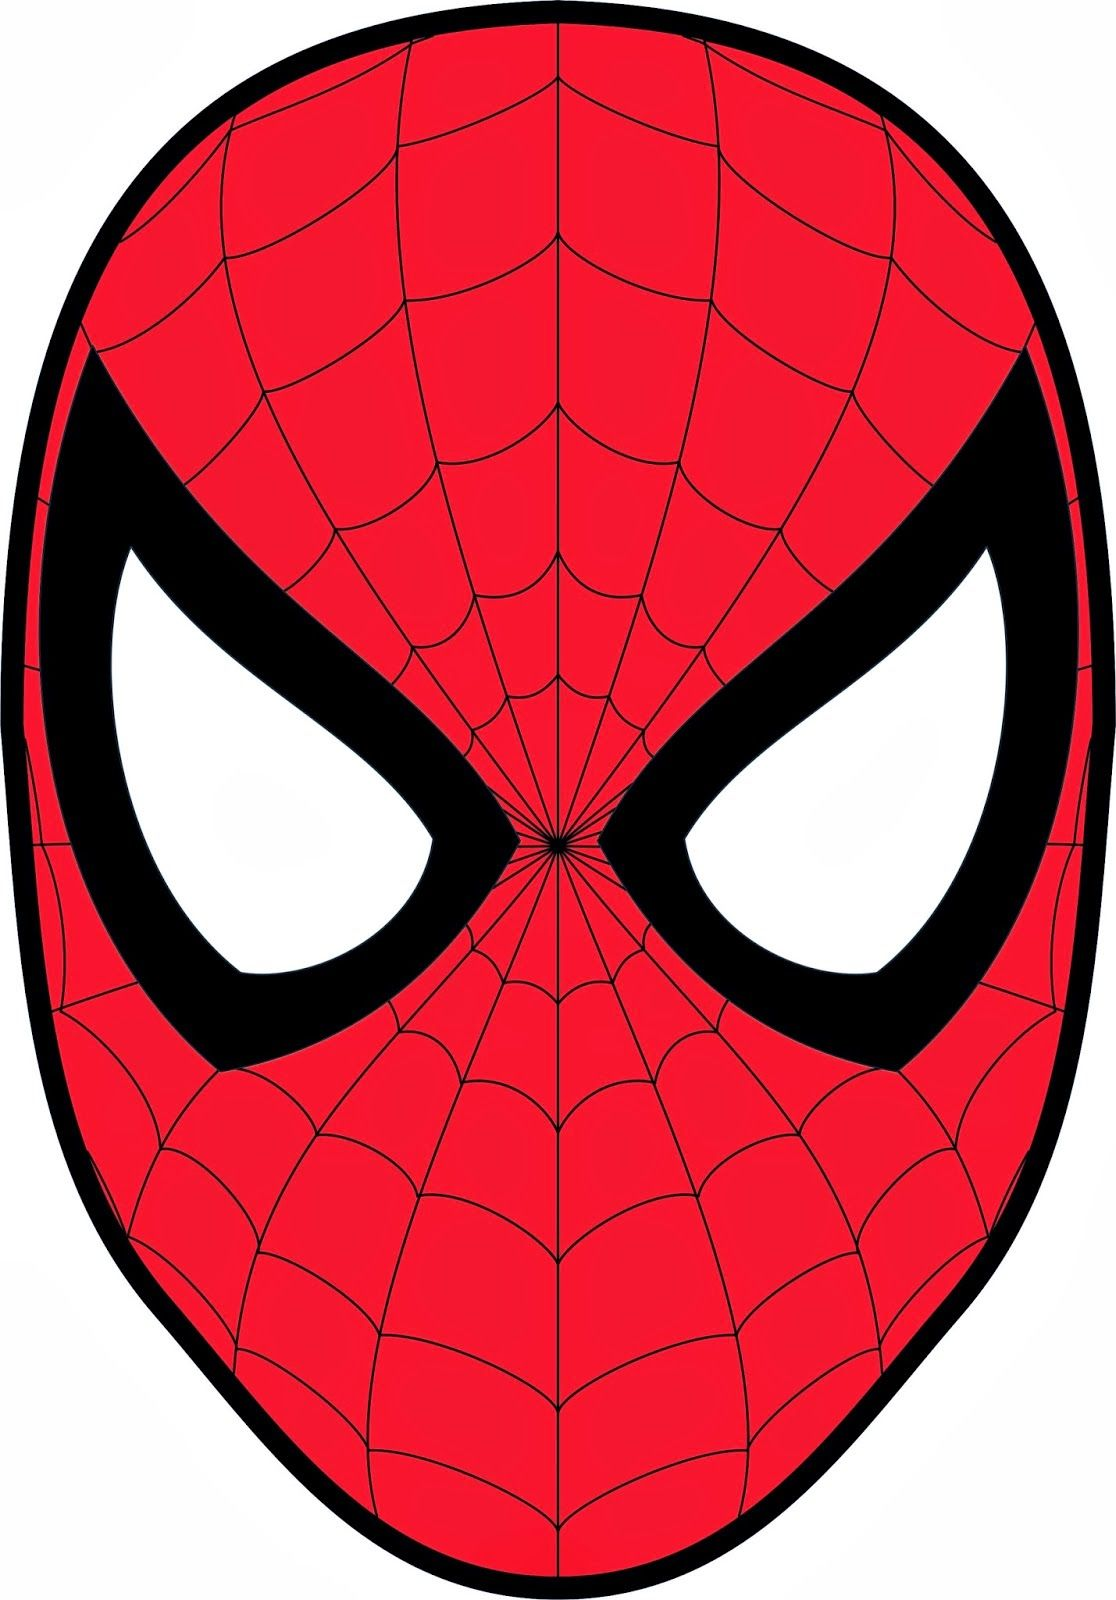 spiderman kit para imprimir gratis oh my fiesta friki hombre rh pinterest com Spider-Man Logos Color Page Print spiderman costume youtube